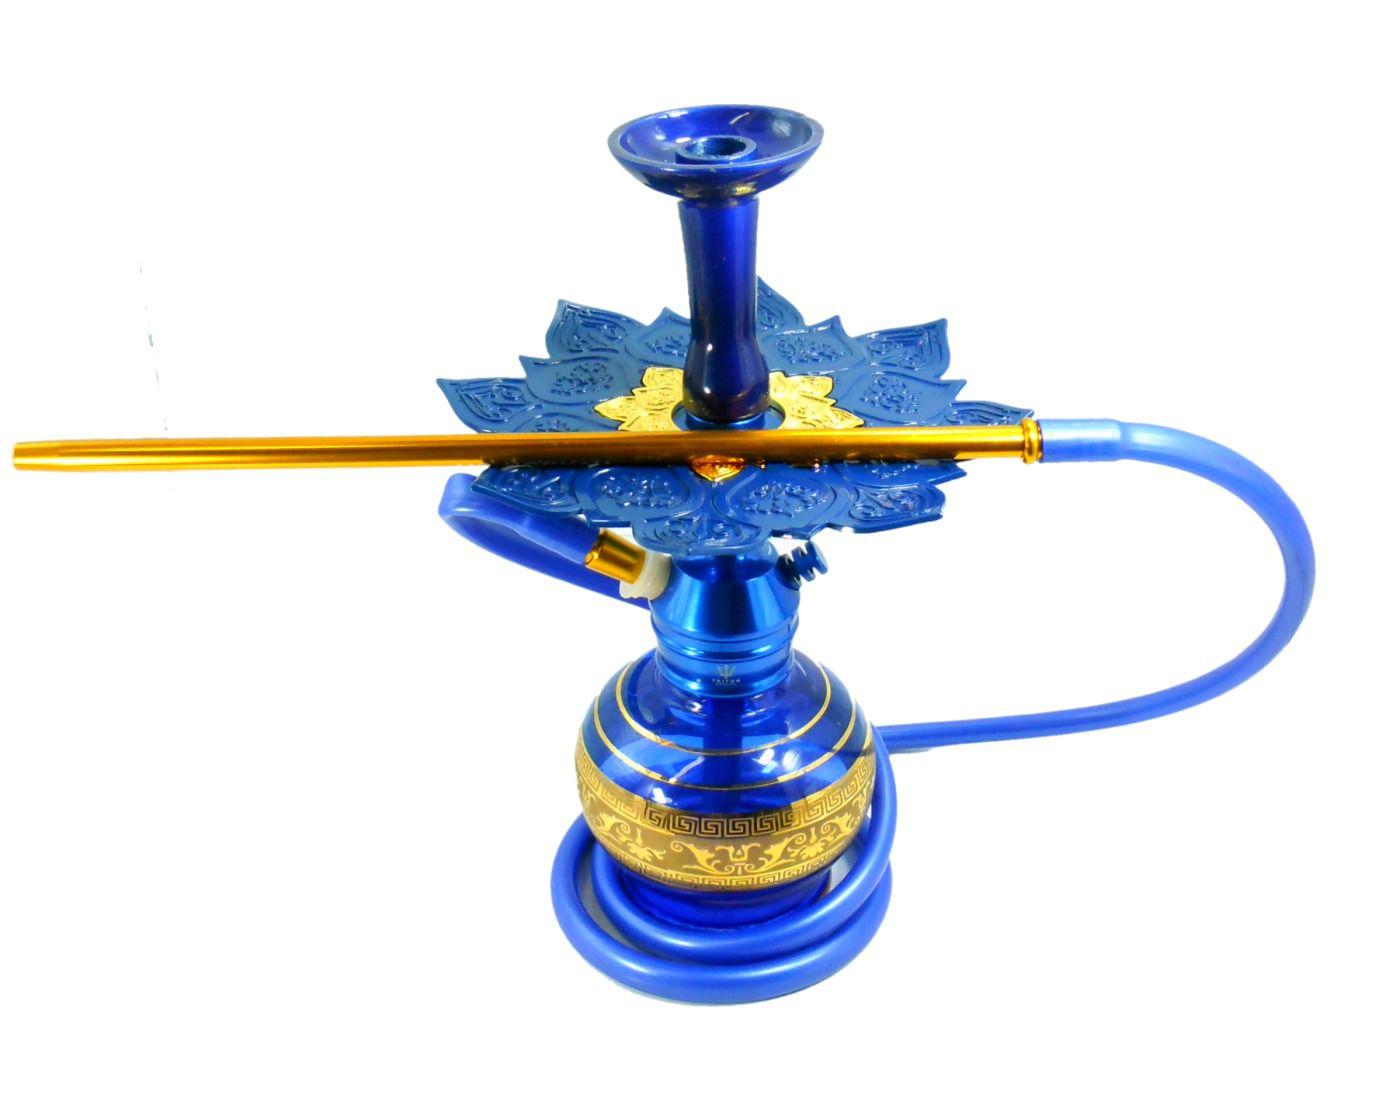 SETUP COMPLETO AZUL: Narguile TRITON ZIP mangueira antichamas c/piteira, vaso Azul/dourado, rosh alumíniO, Prato Athenas